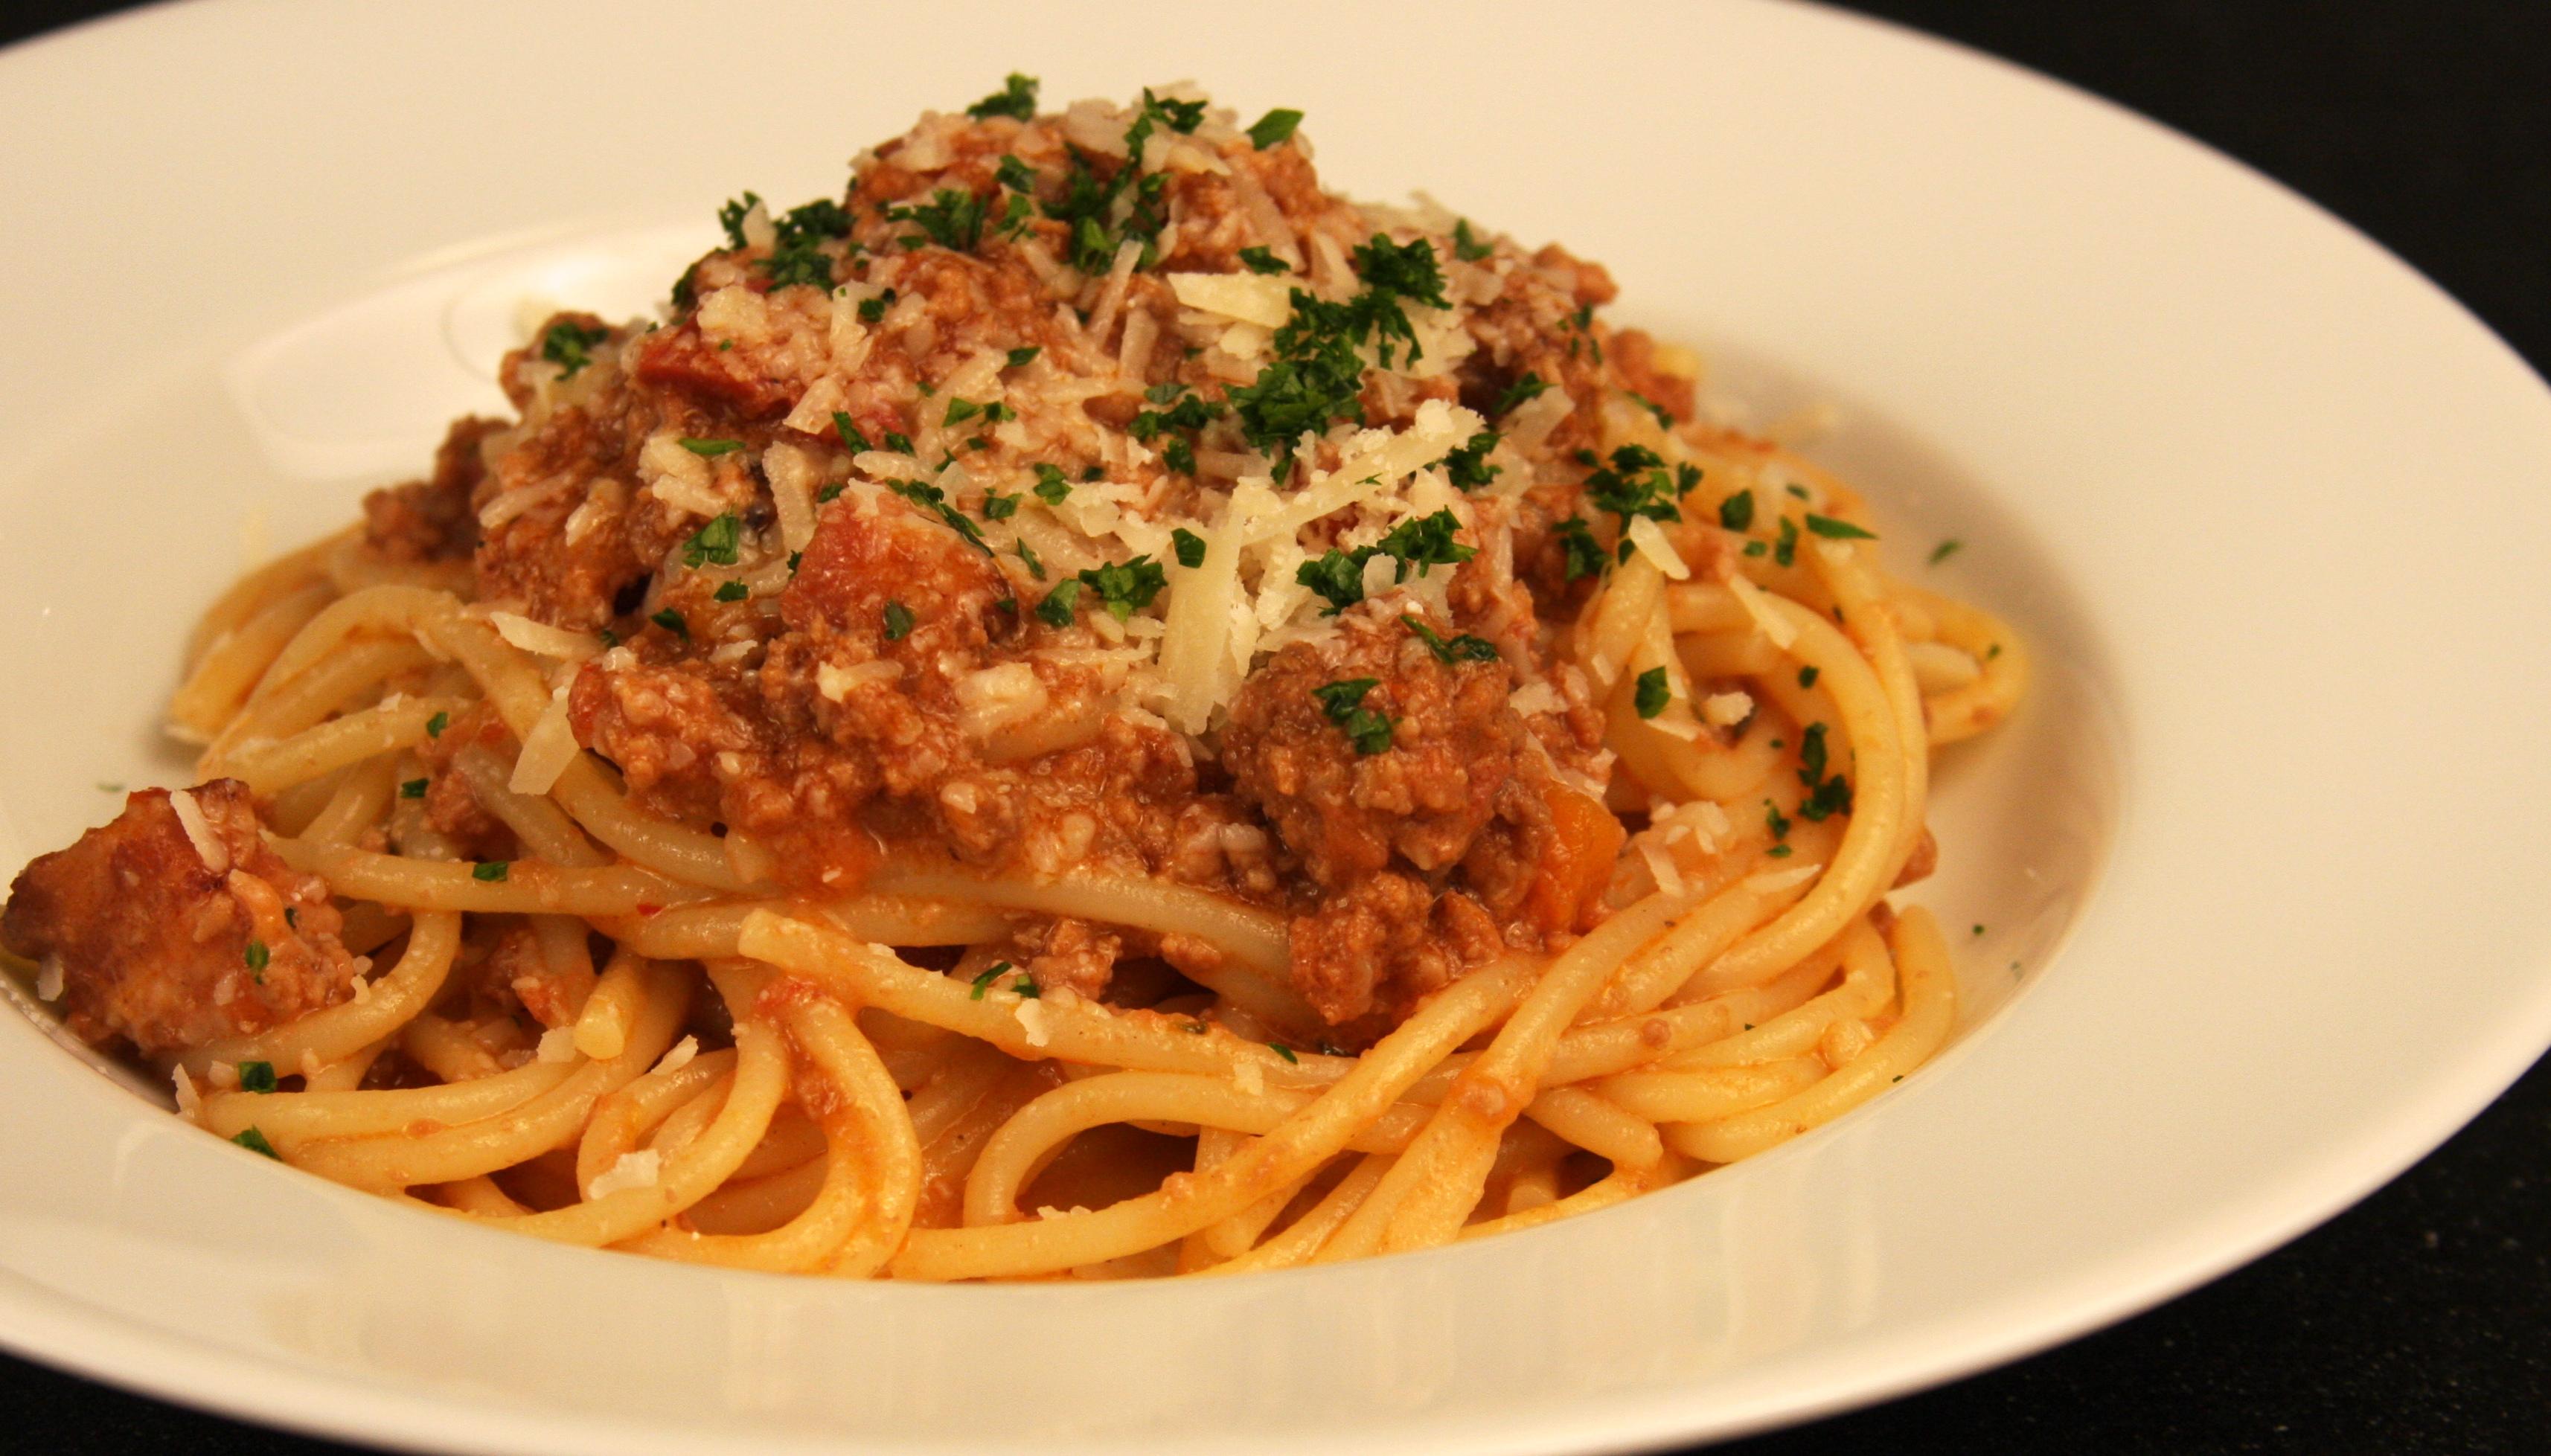 spaghetti bolognese spaghetti bolognese a firm spaghetti bolognese on ...